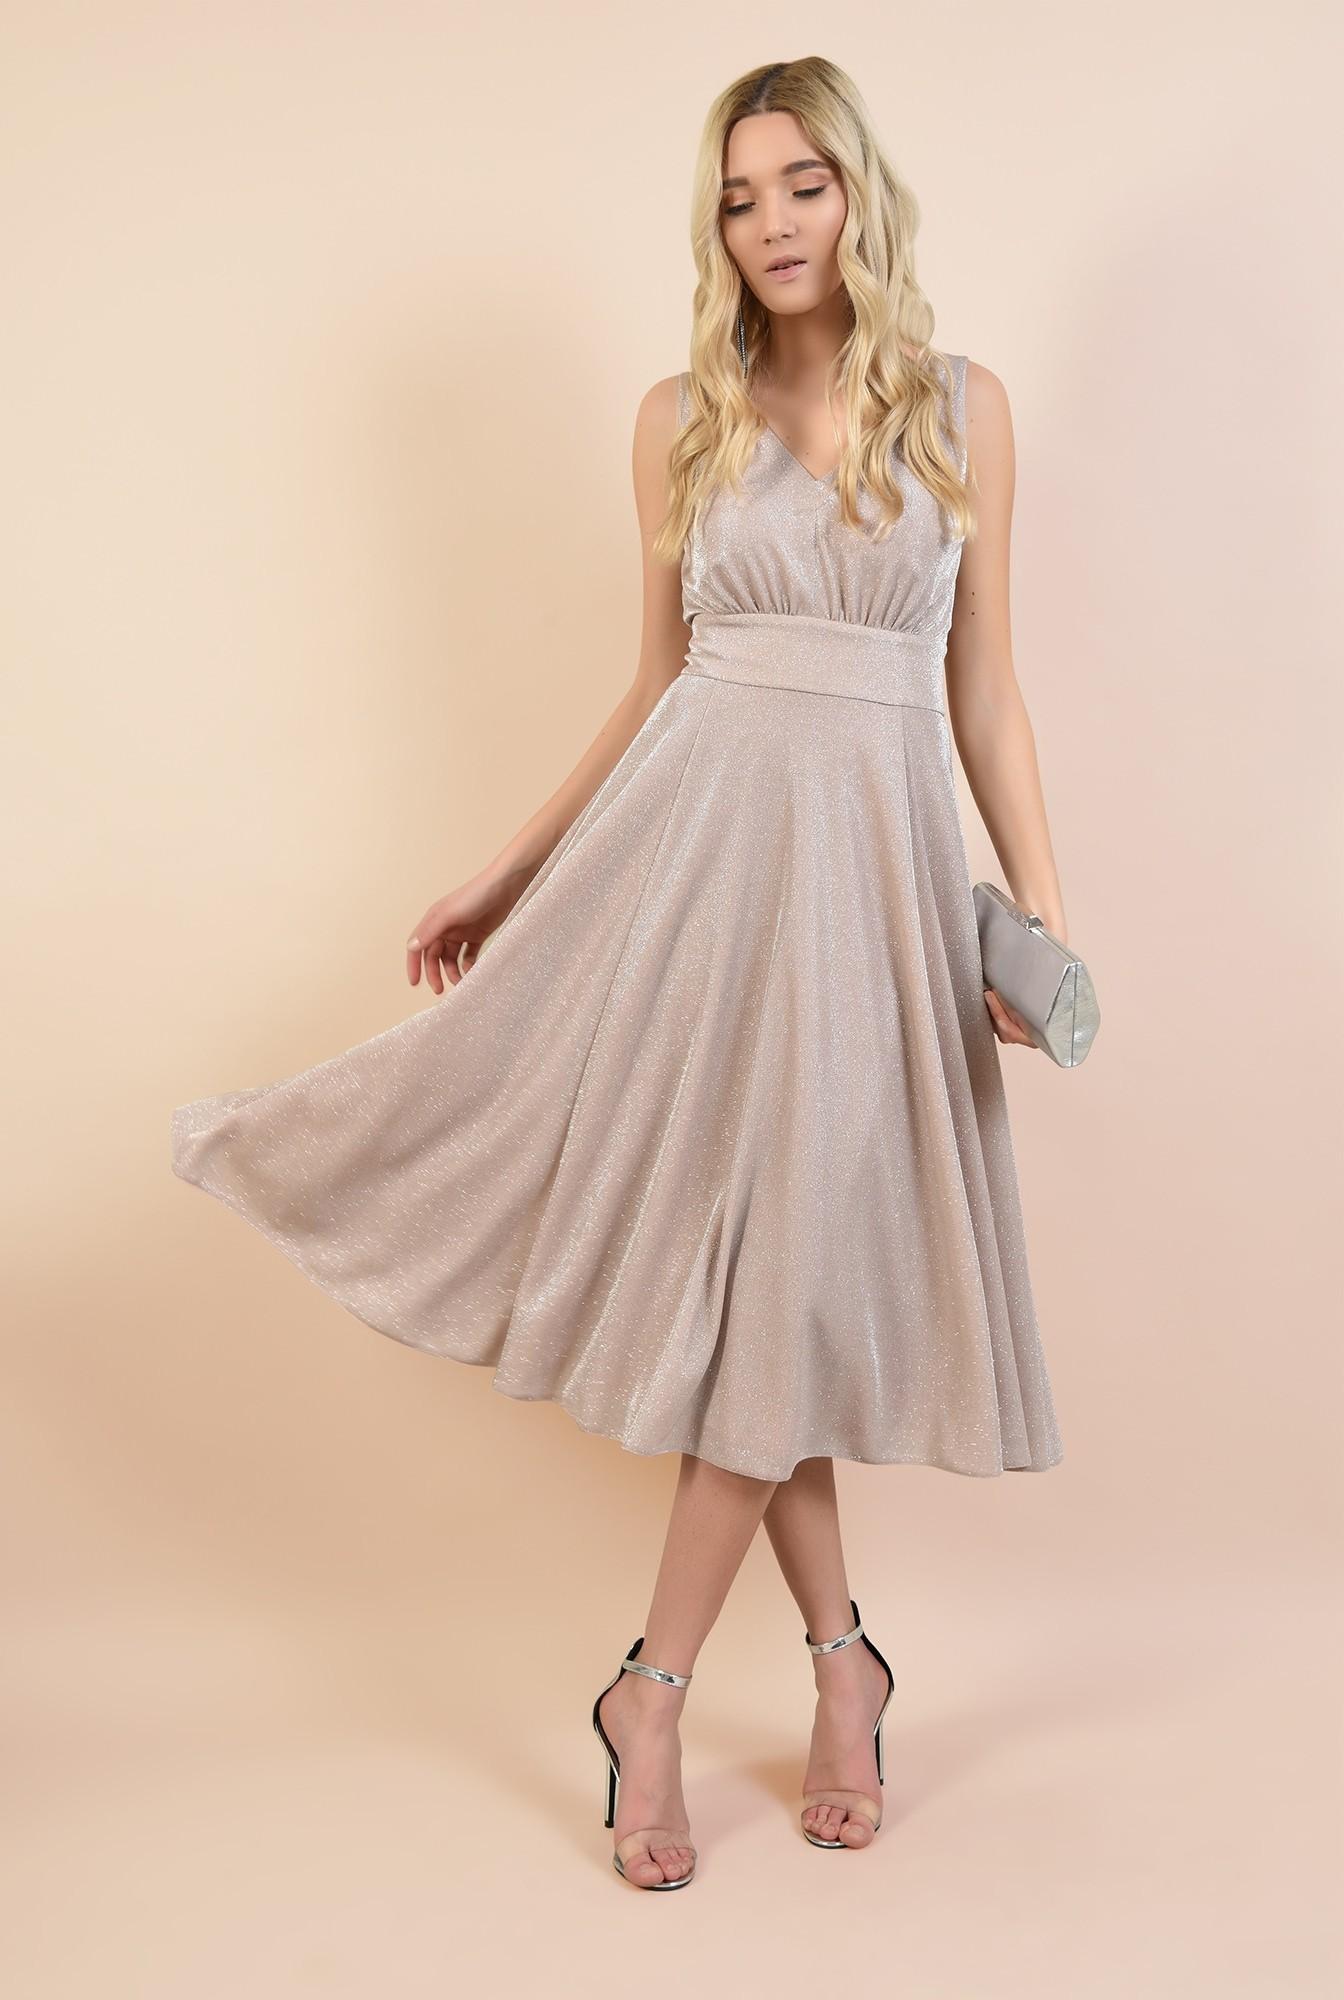 3 - rochie eleganta, roz, cu sclipici, midi, evazata, Poema